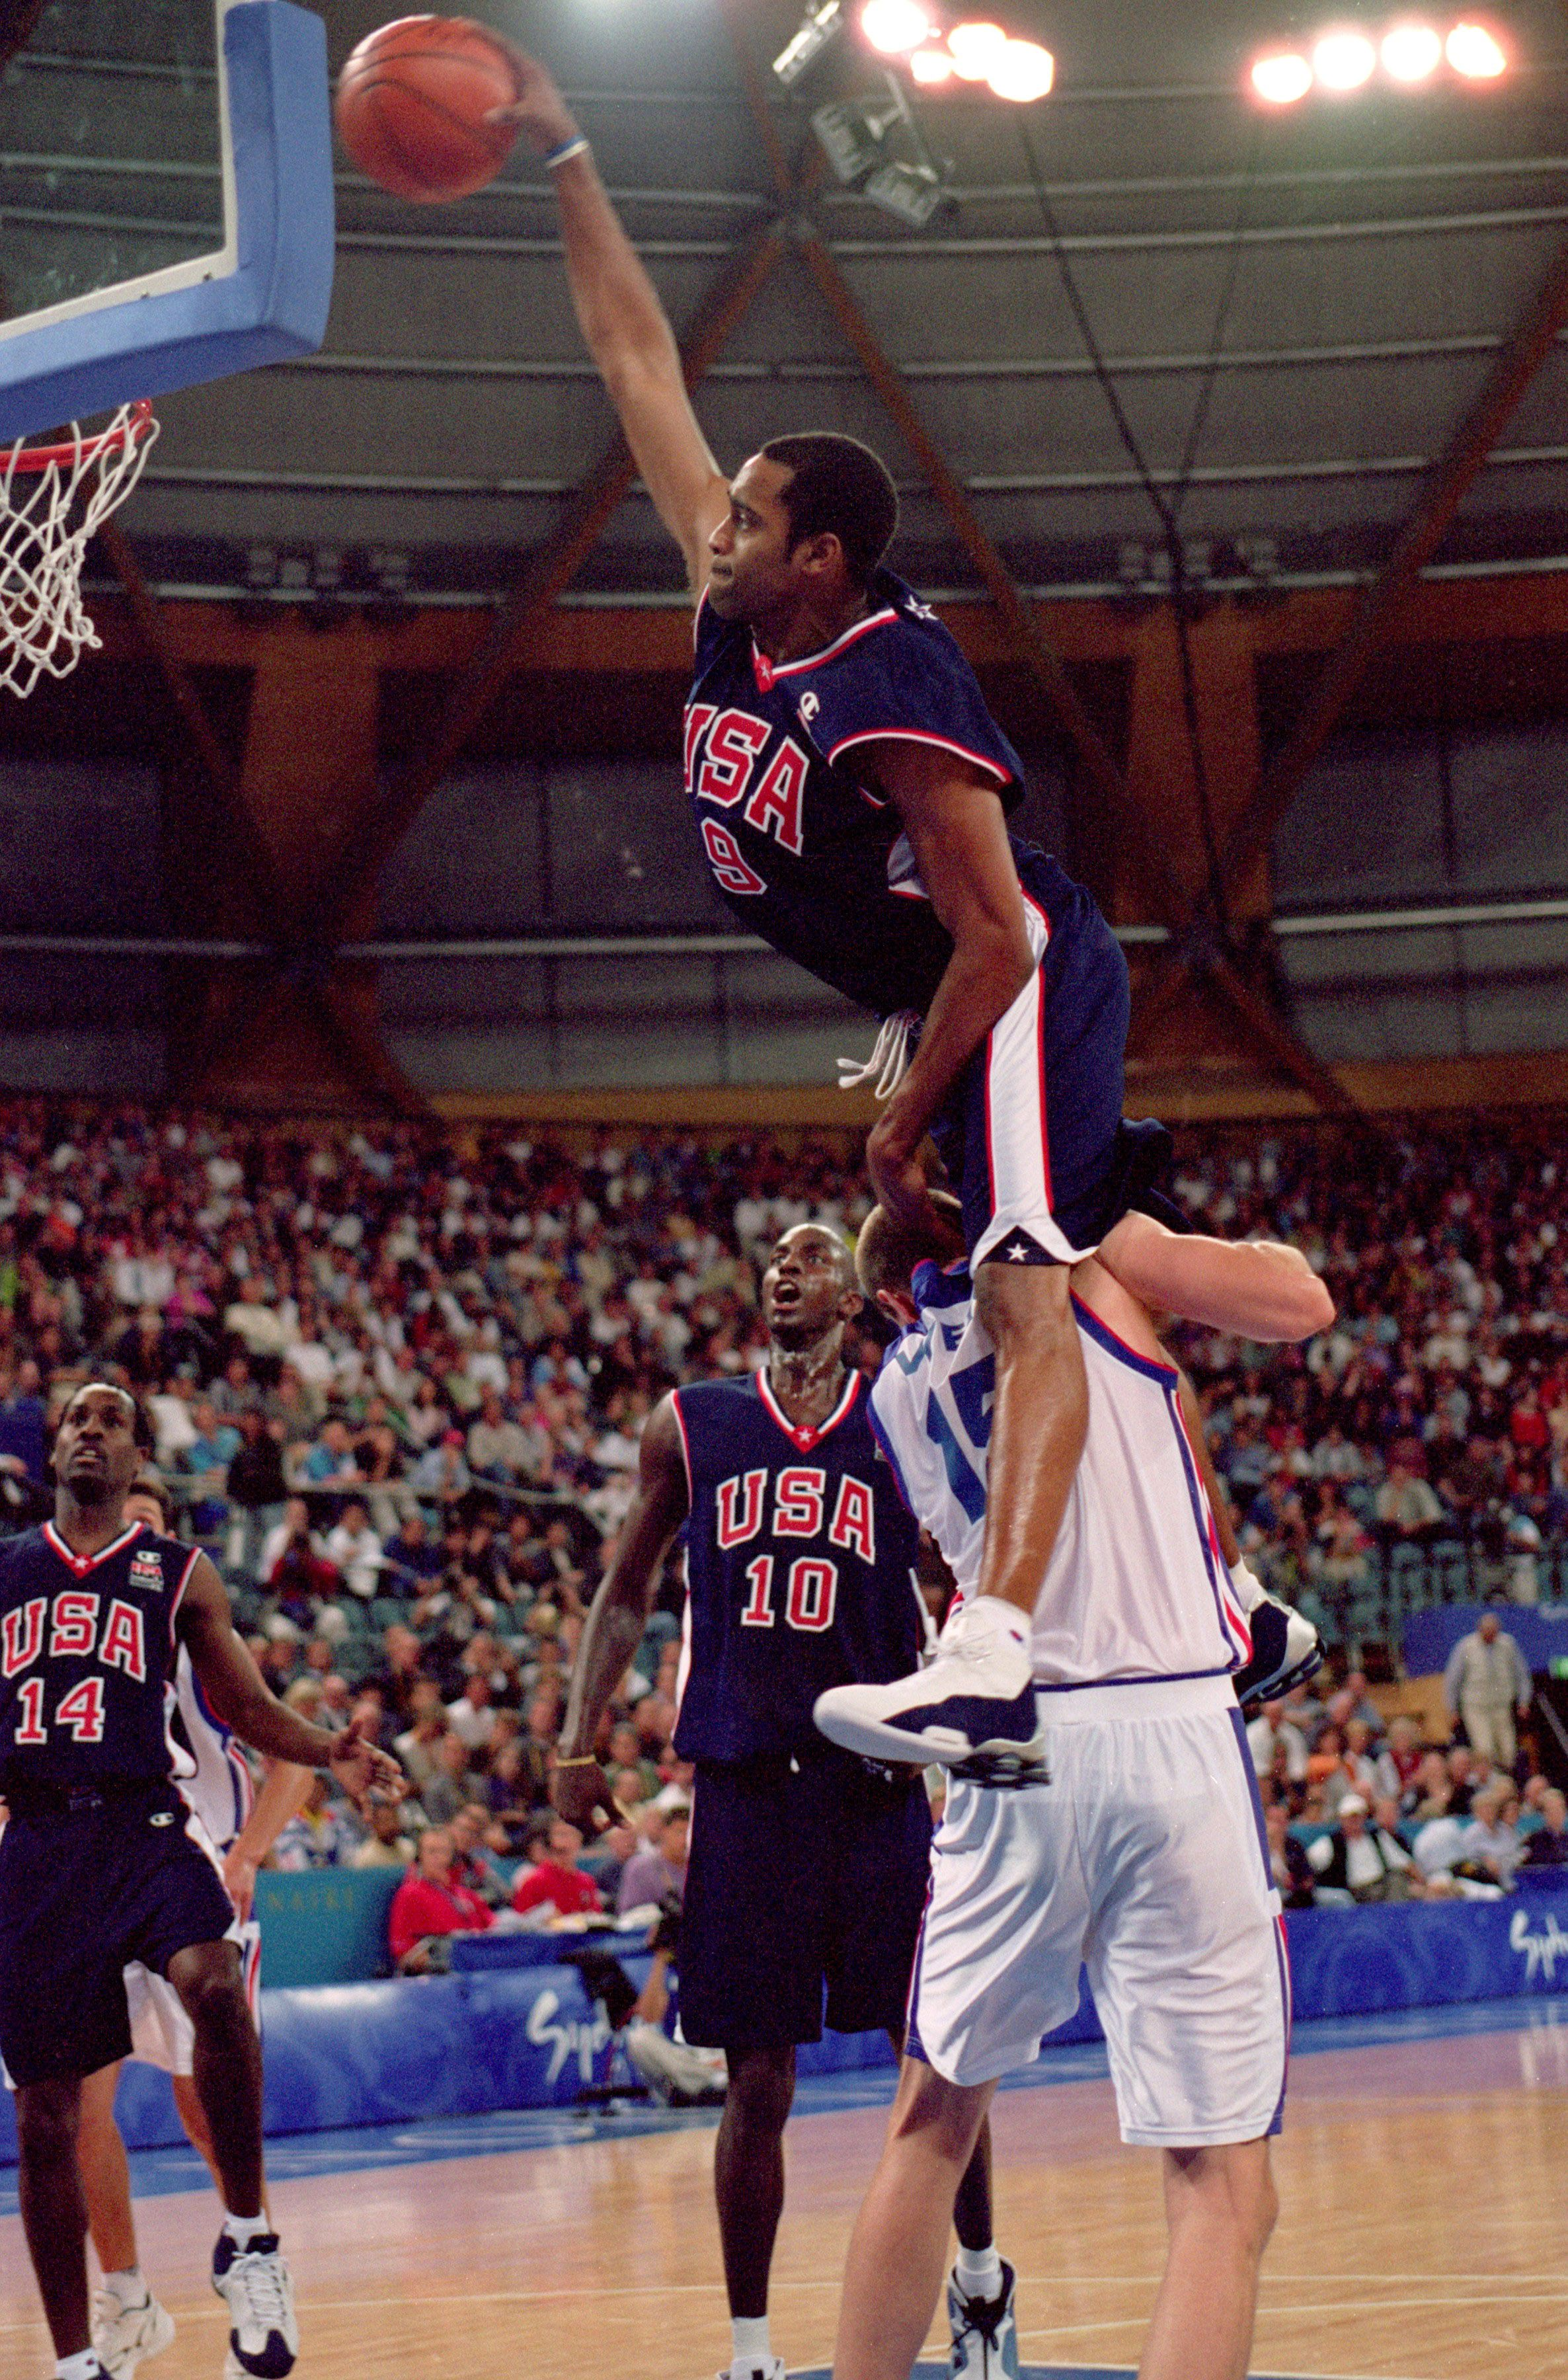 Vince Carter dunking over an opponent